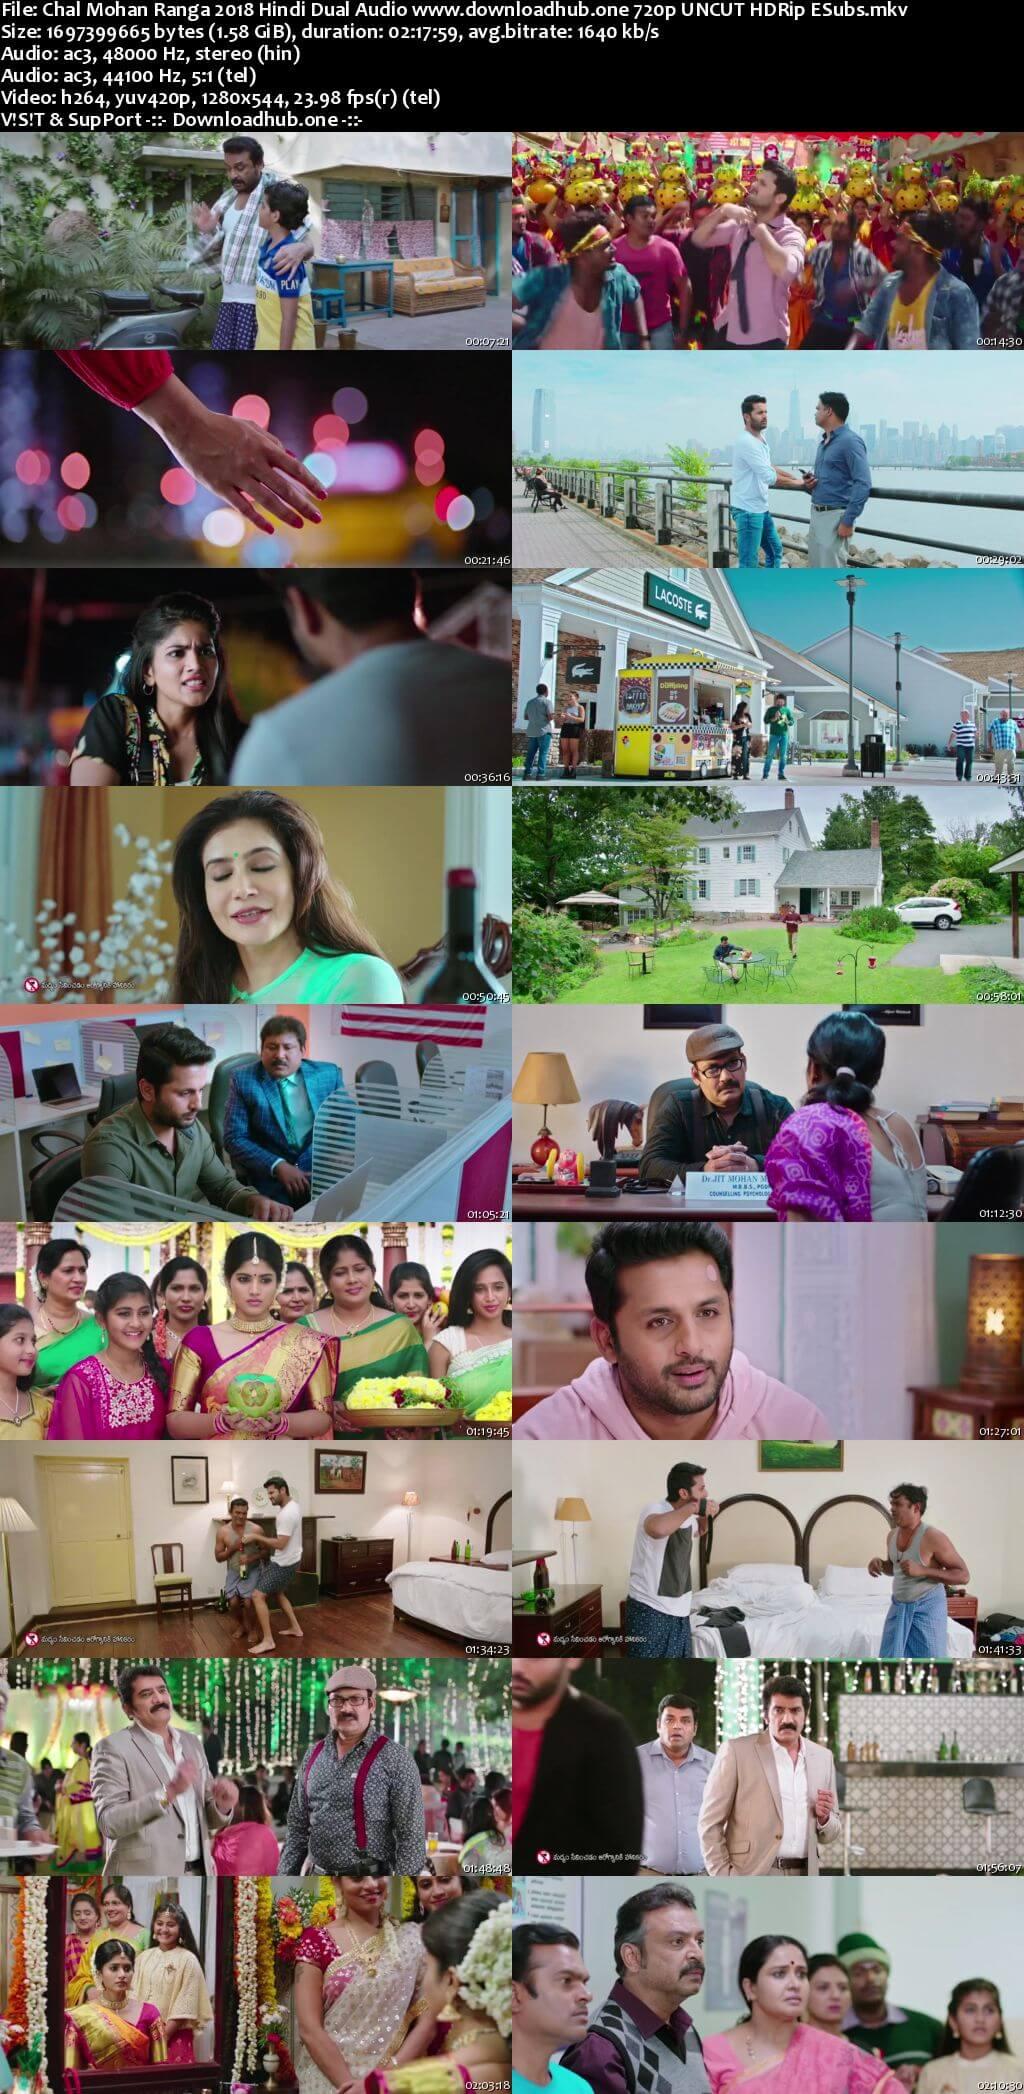 Chal Mohan Ranga 2018 Hindi Dual Audio 720p UNCUT HDRip ESubs